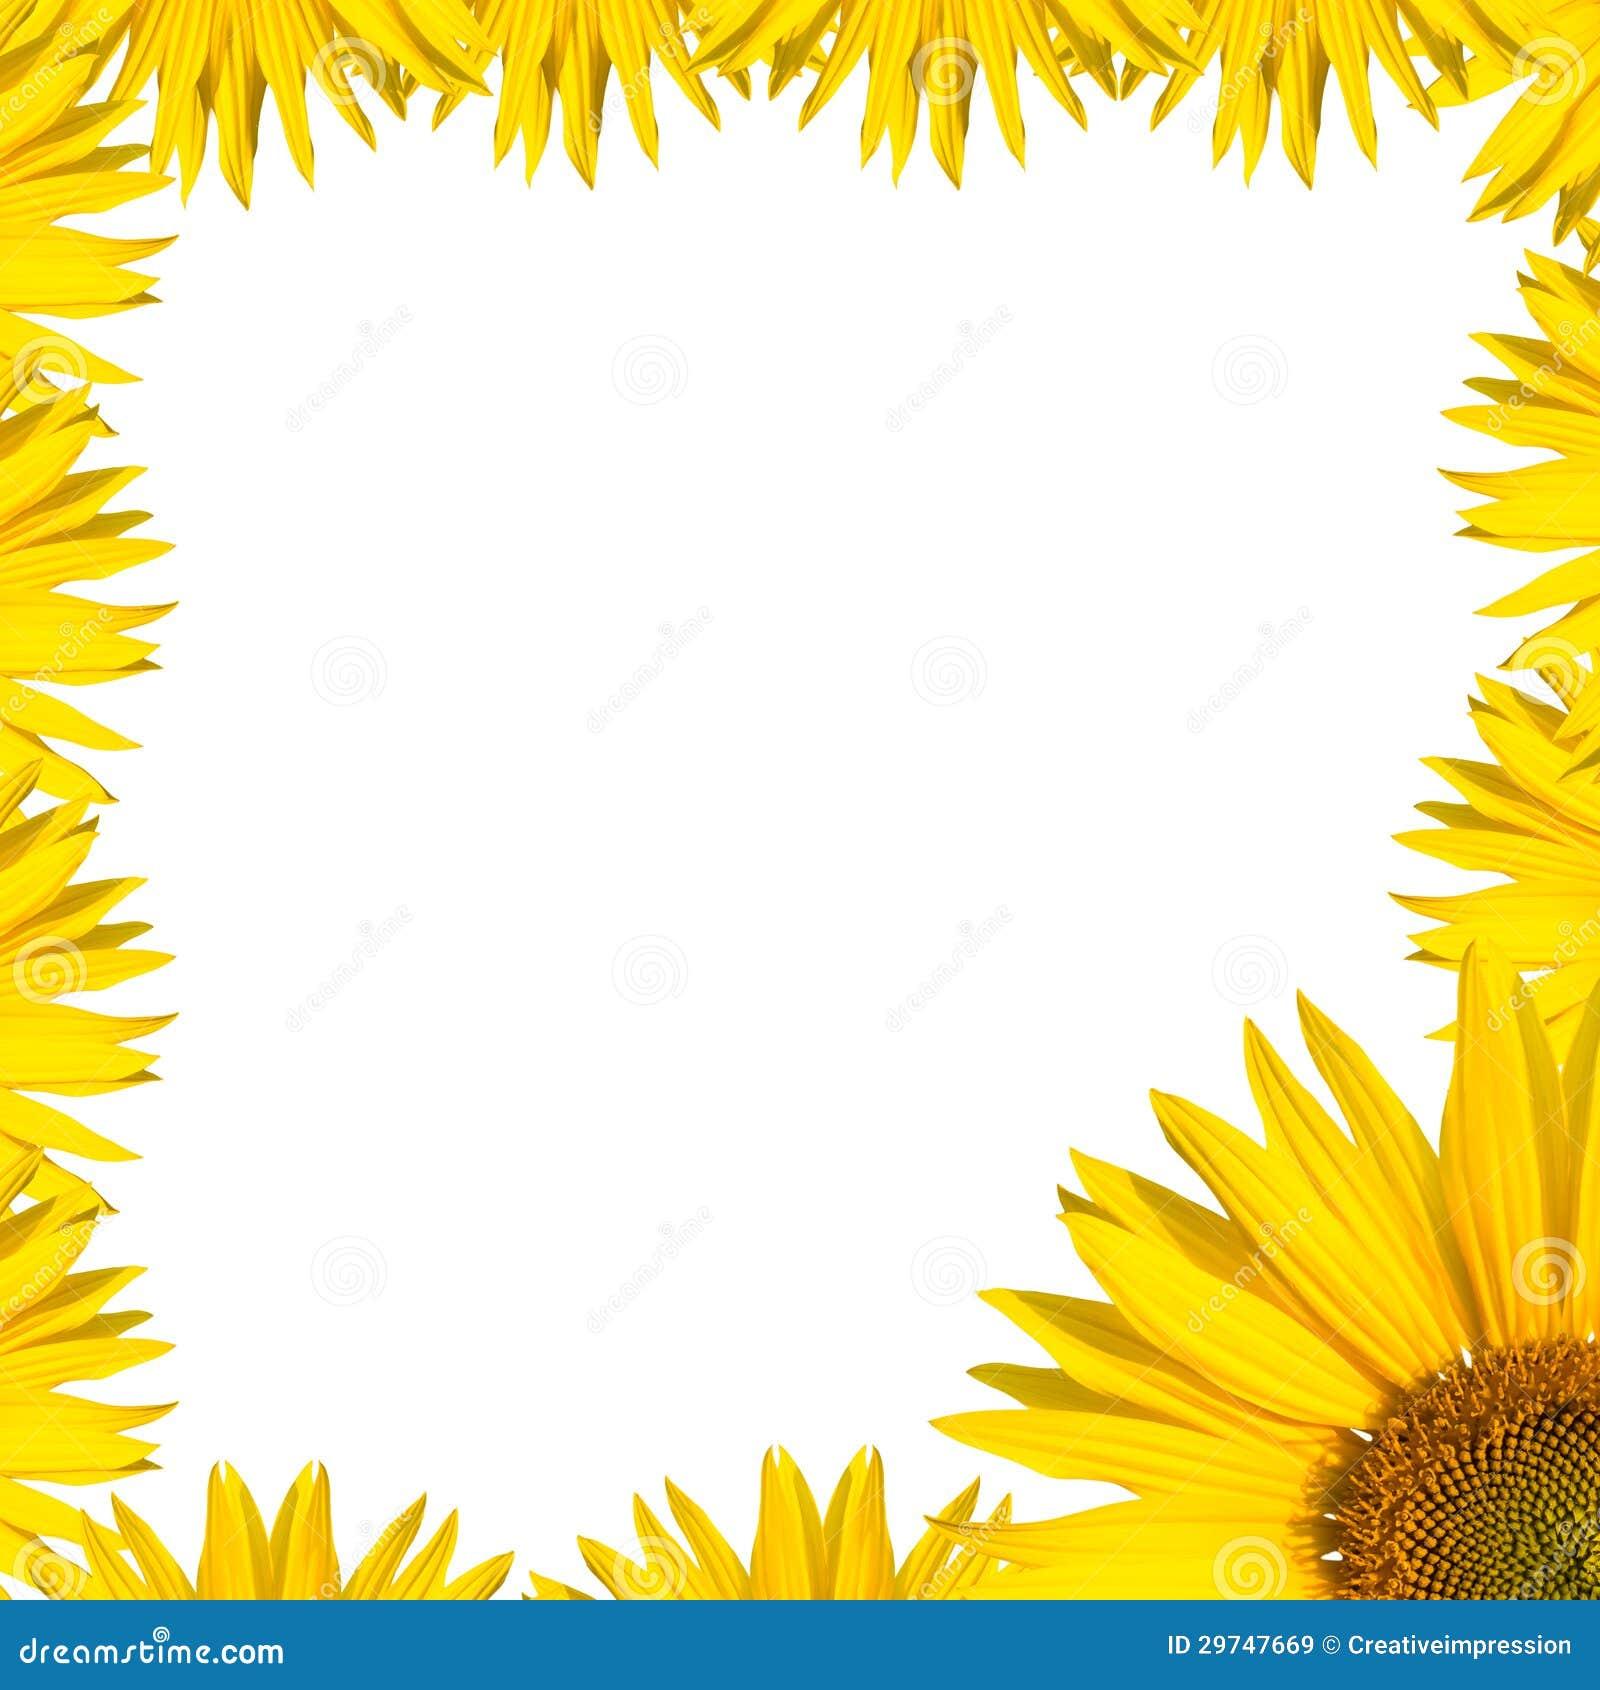 Sunflower Border Design Royalty Free Stock Images - Image ...